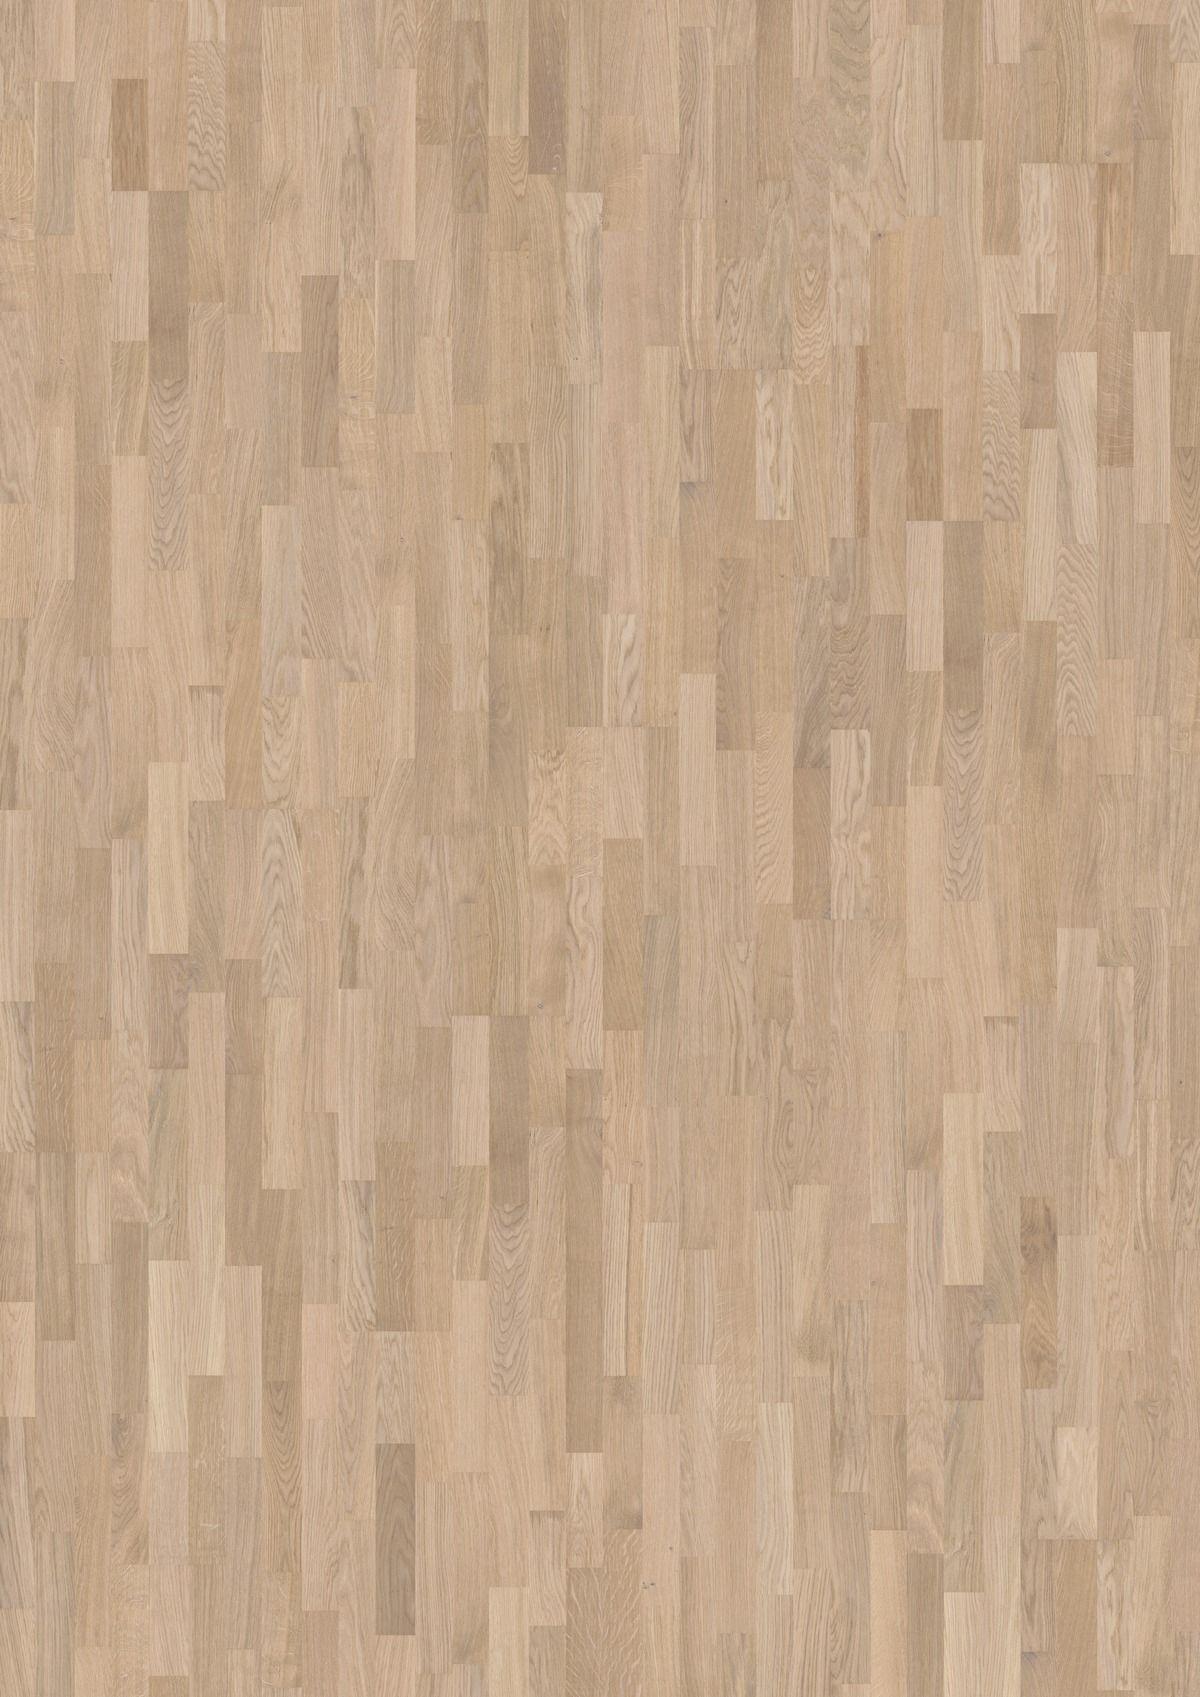 Kahrs Lumen Oak Mist Ultra Matt White Wood Flooring Www Kahrs Com In 2020 Wood Floors Flooring Engineered Wood Floors